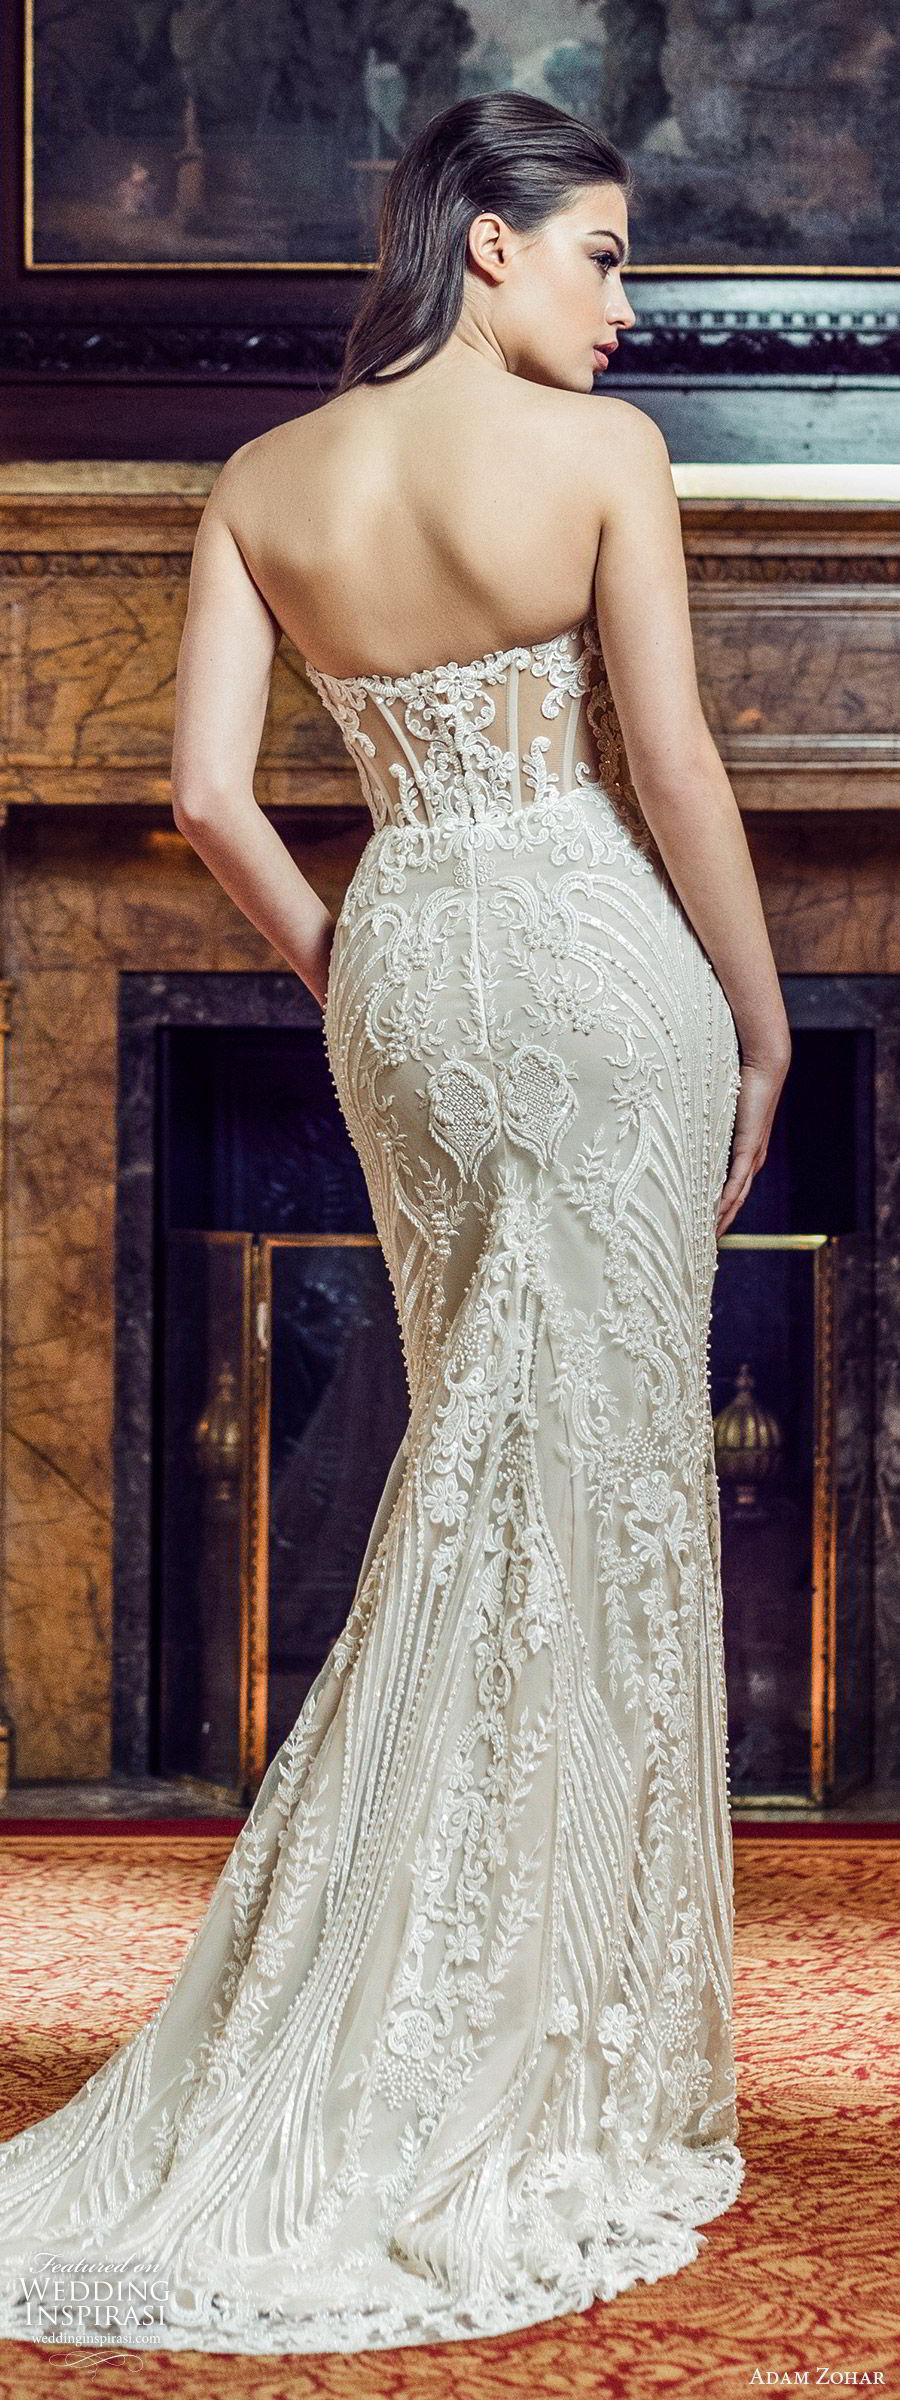 adam zohar 2020 bridal strapless sweetheart fully embellished lace sheath wedding dress b(11) glam elegant chapel train bv